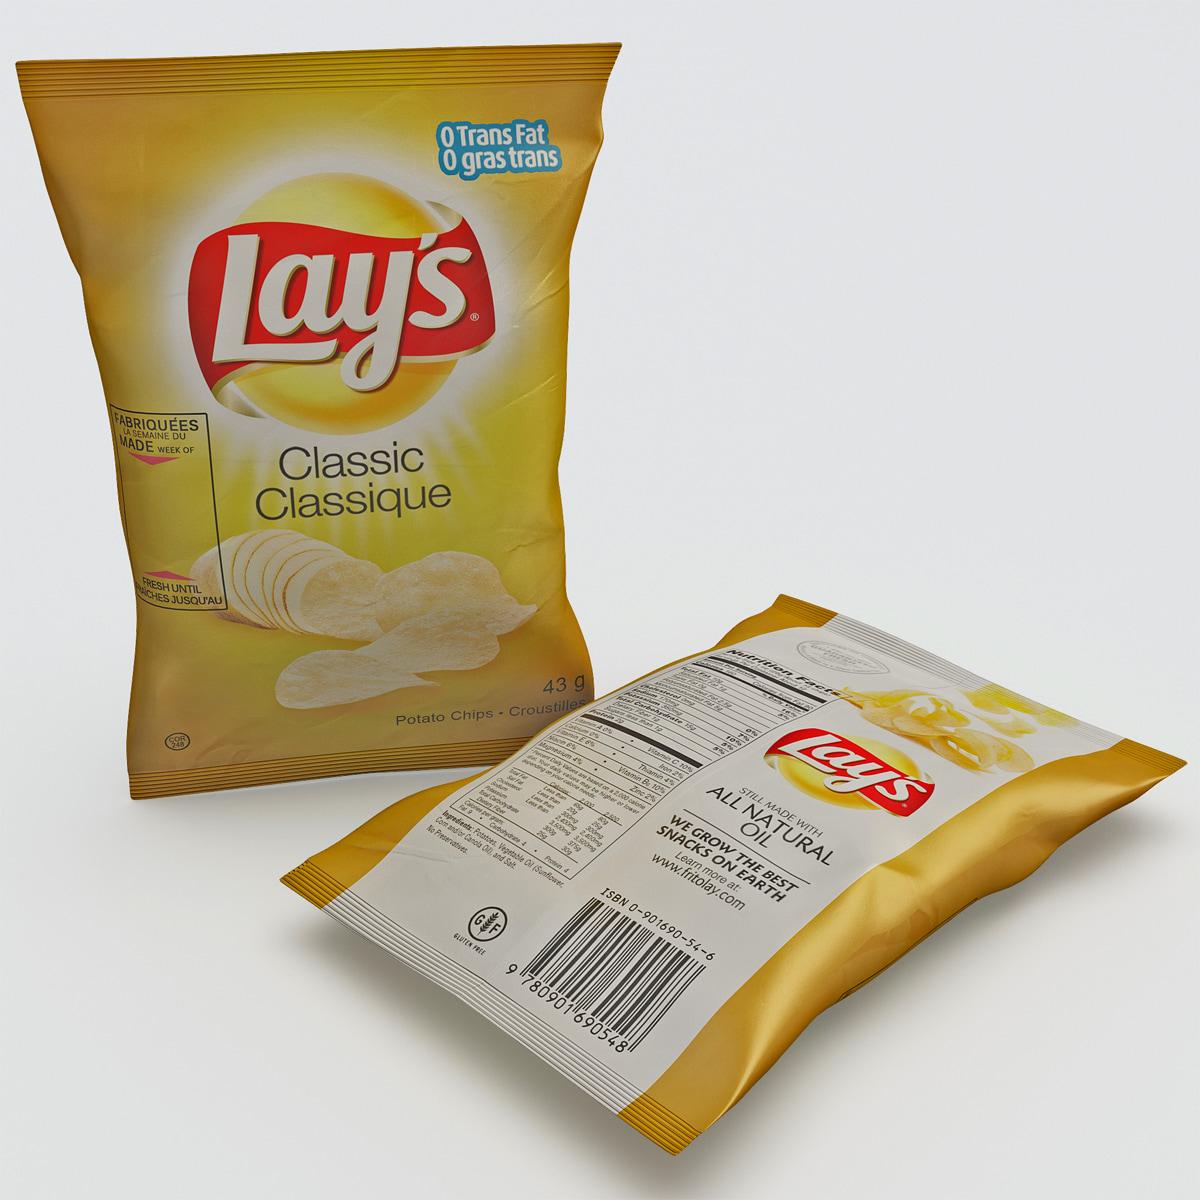 277743_Lays_Chips_Bag_001.jpg